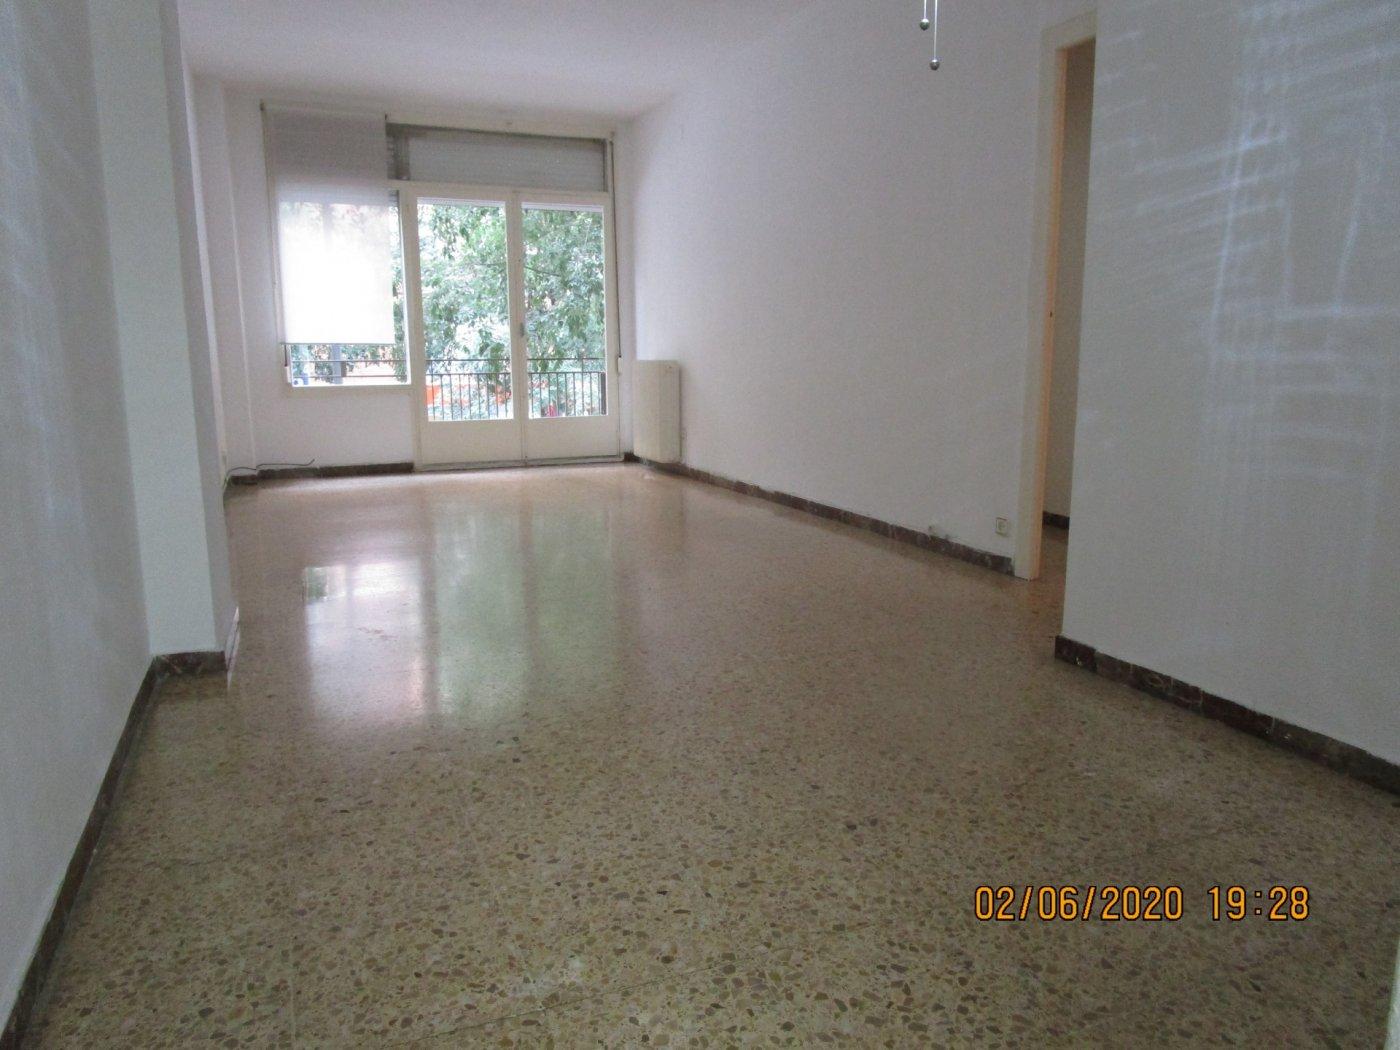 Flat for rent in Sants, Barcelona